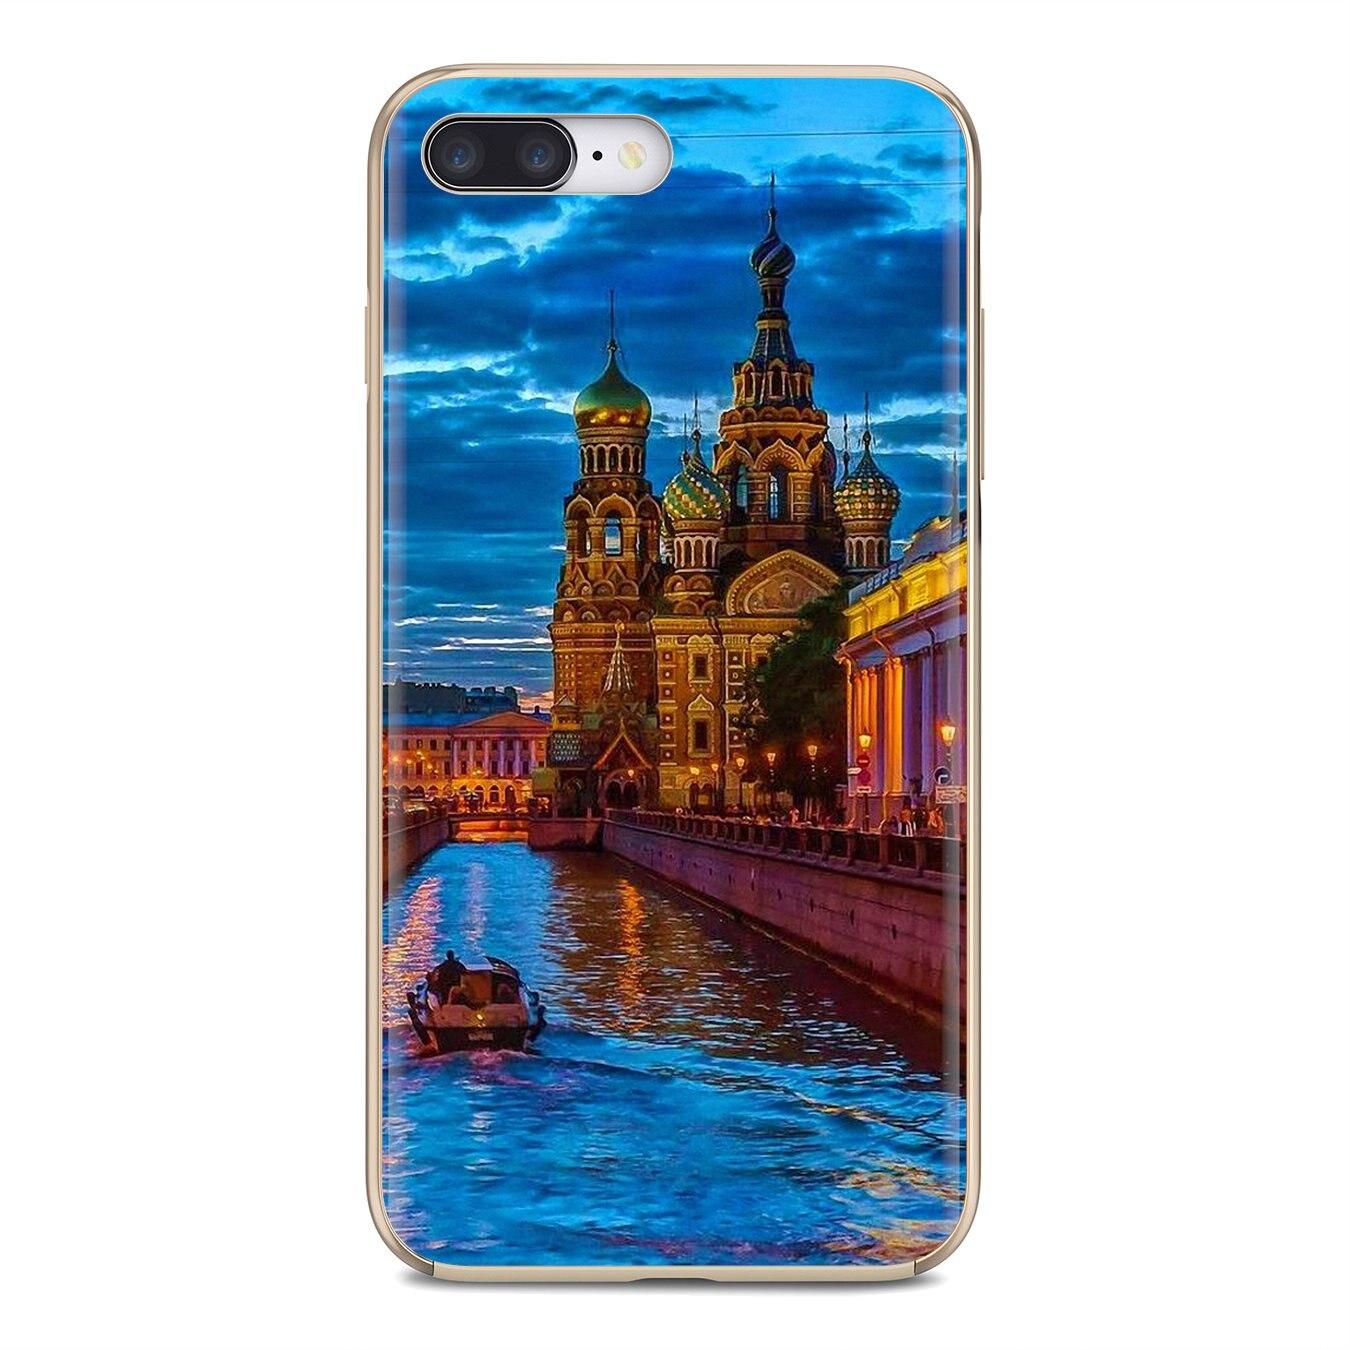 Funda de silicona para Huawei Mate Honor 4C 5C 5X 6X 7 7A 7C 8 9 10 8C 8X 20 Lite Pro de San Petersburgo